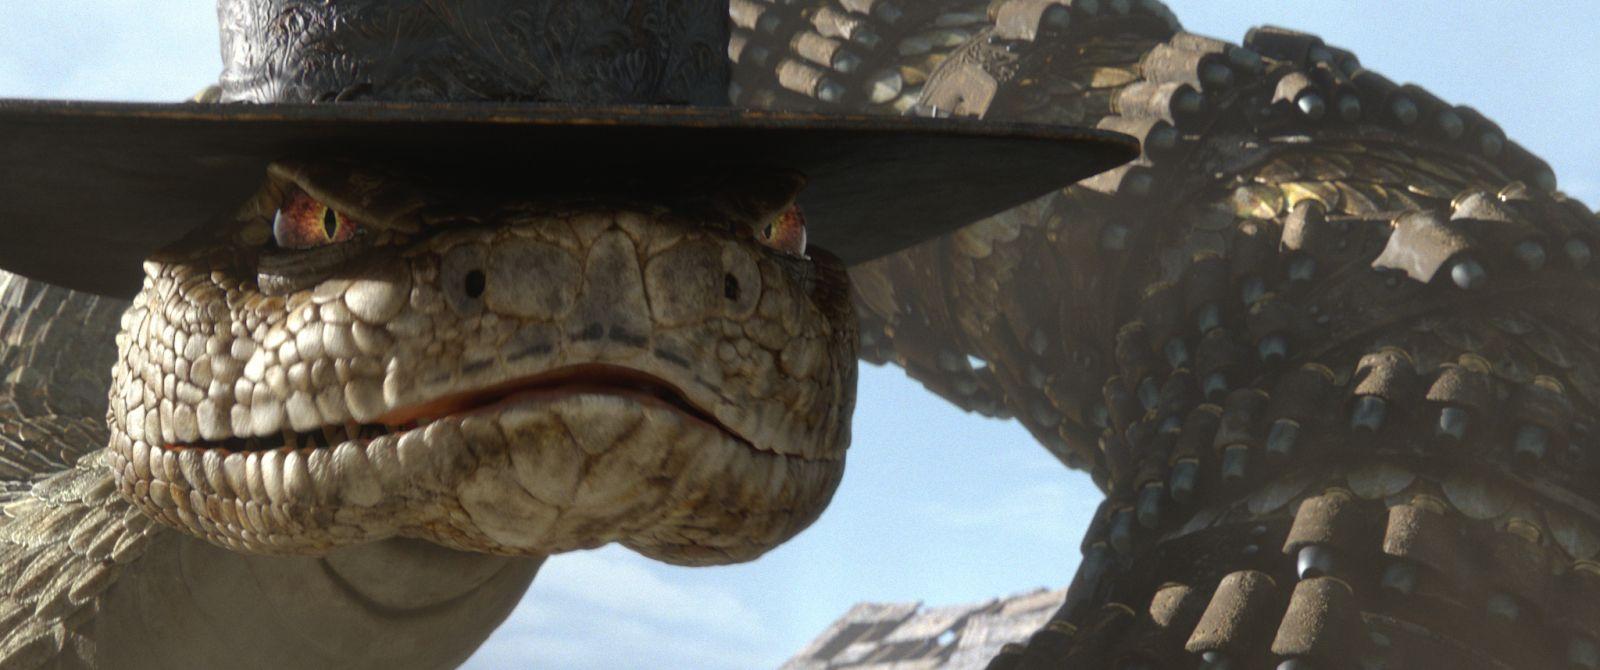 The Rattlesnake movie